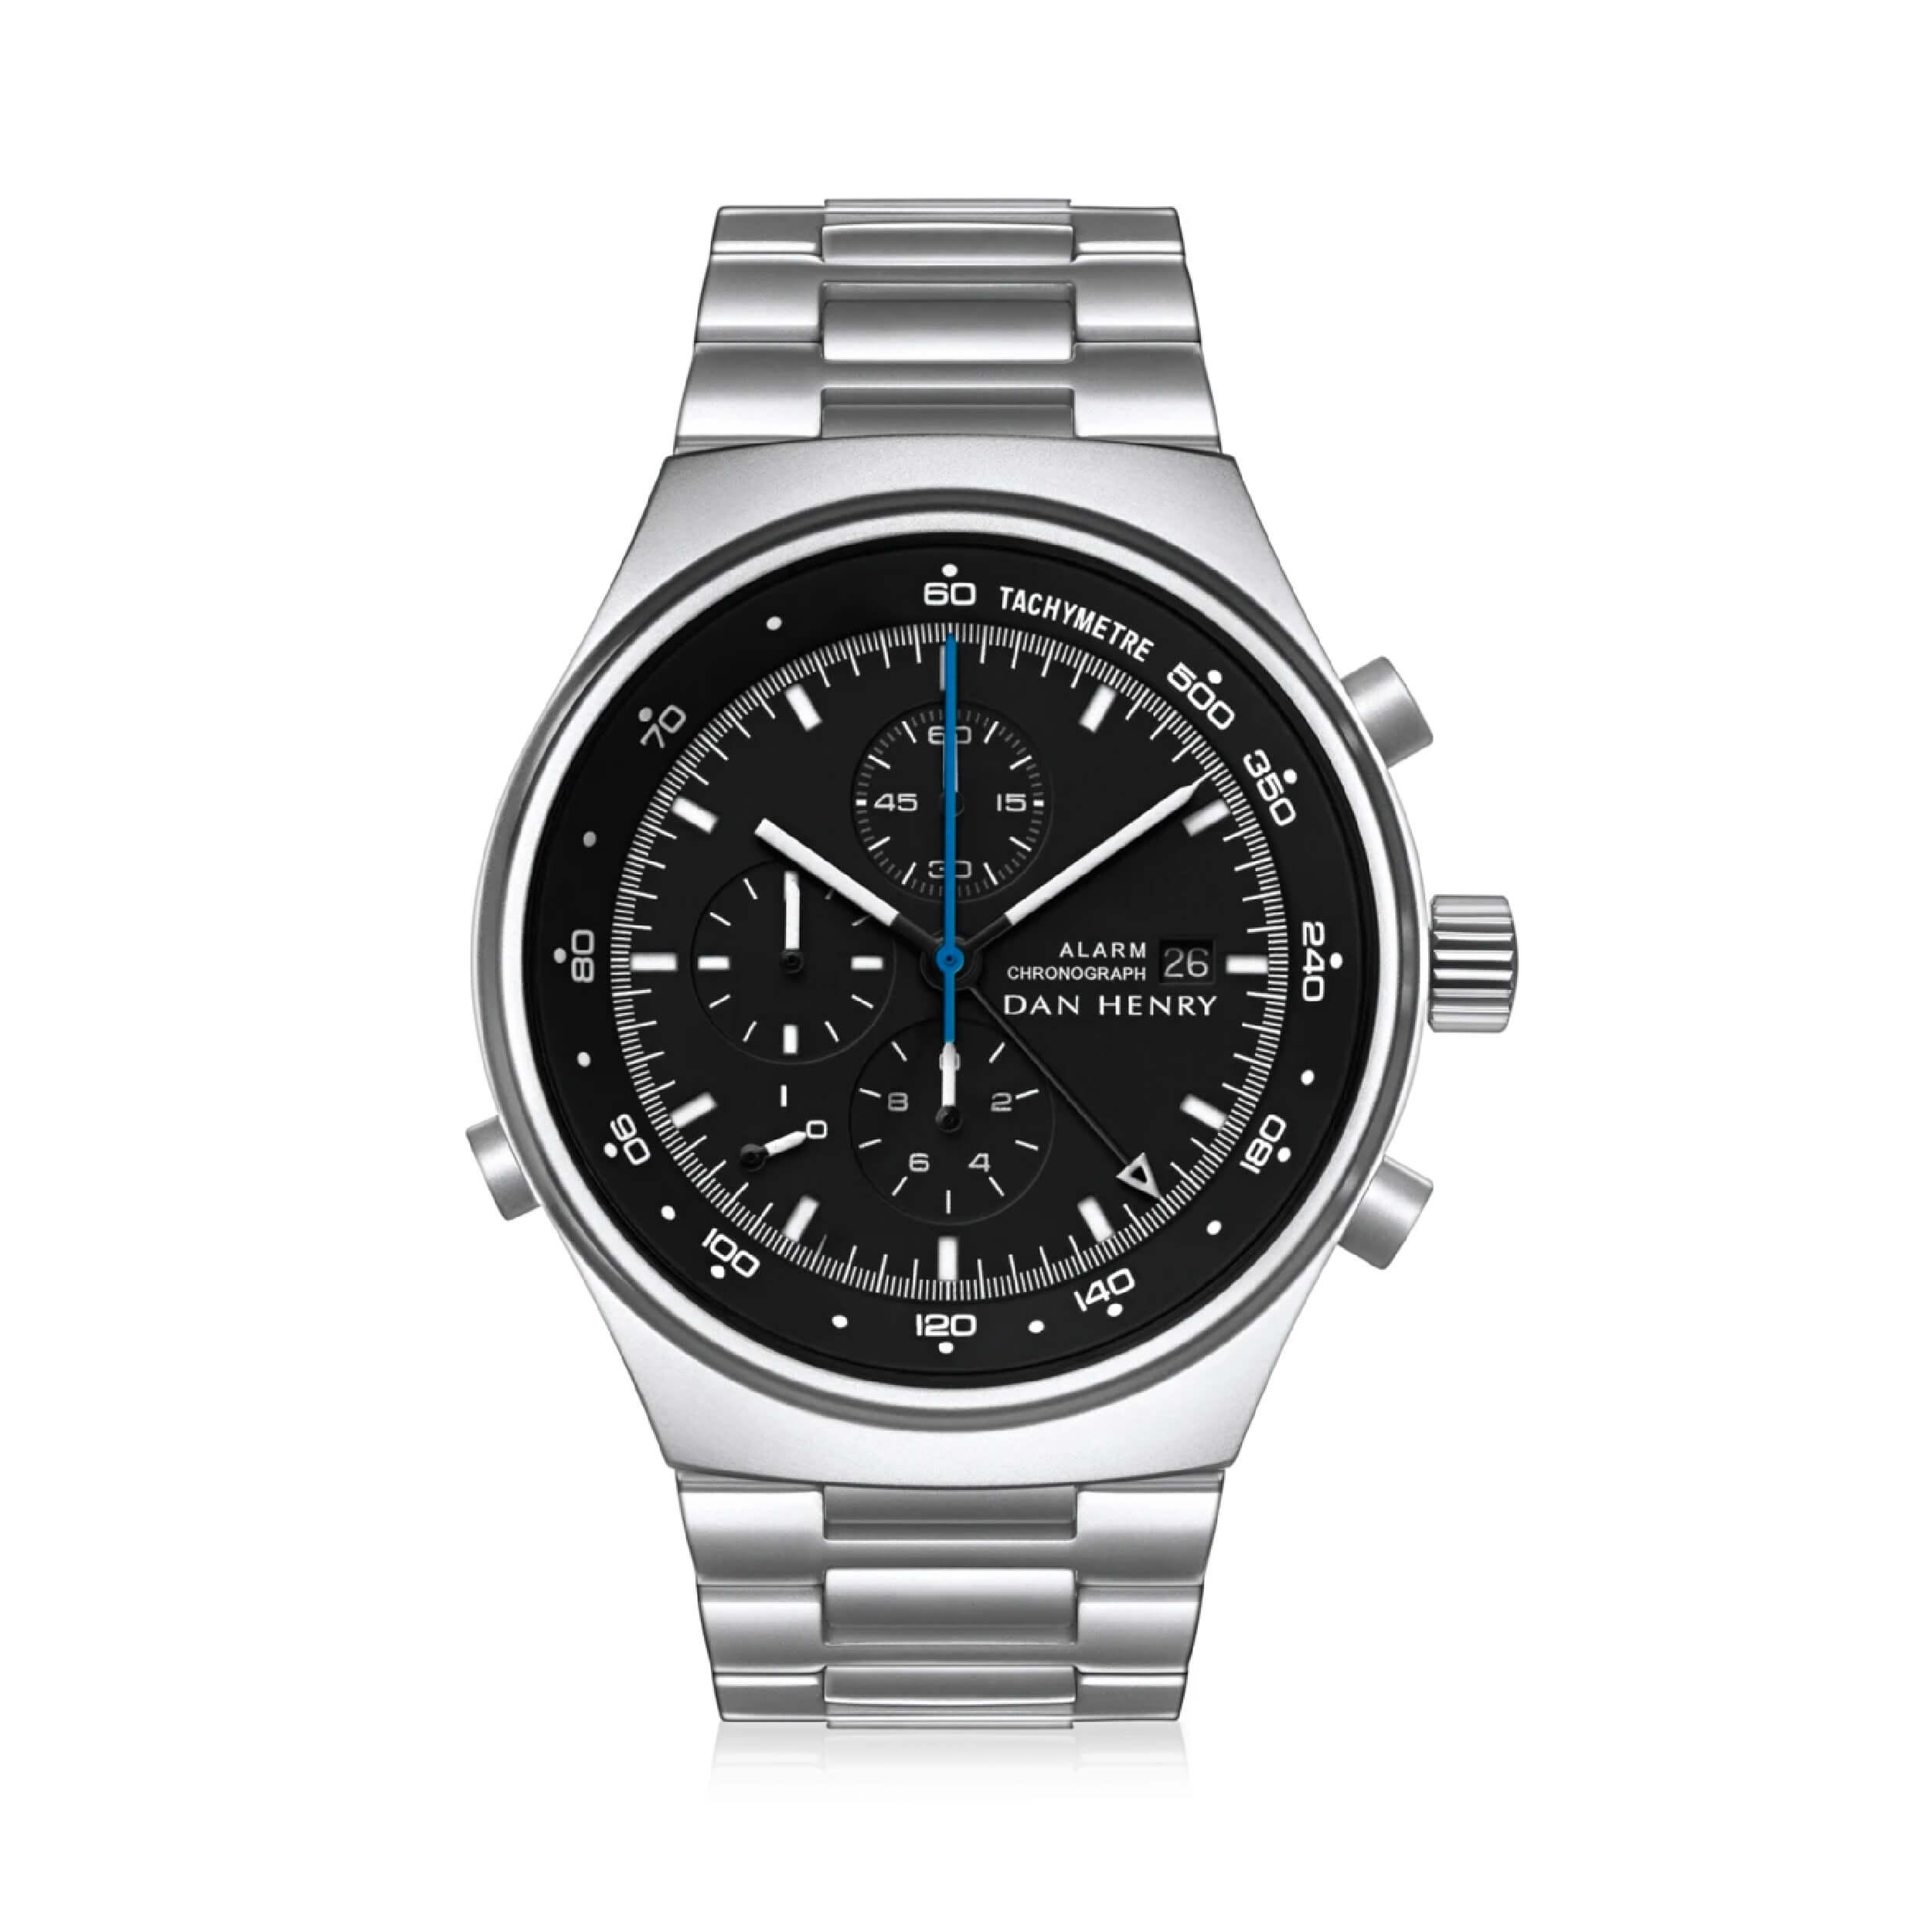 Dan Henry 1972 Chrono Alarm | Best Chronograph Watch Under £500